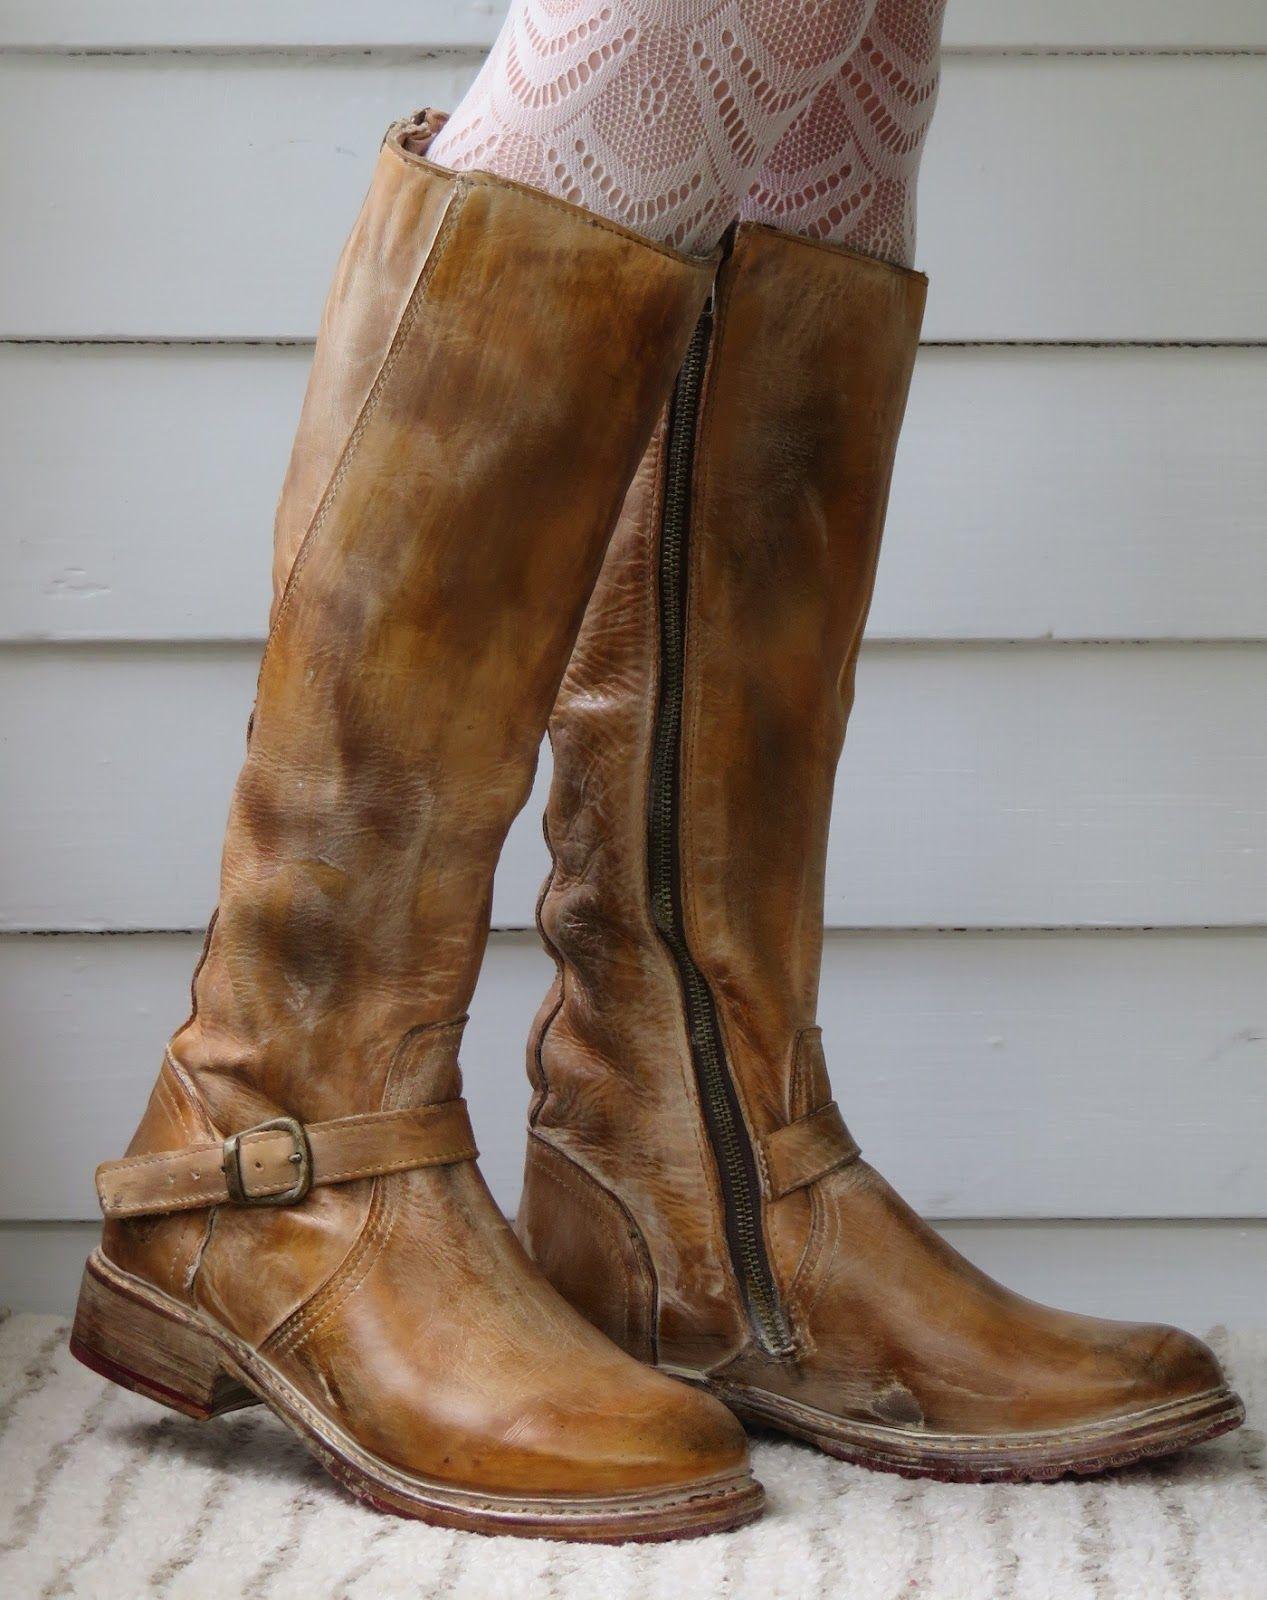 fba6034f4e5 Howdy Slim! Riding Boots for Thin Calves: Bed Stu Glaye | Pantofi ...